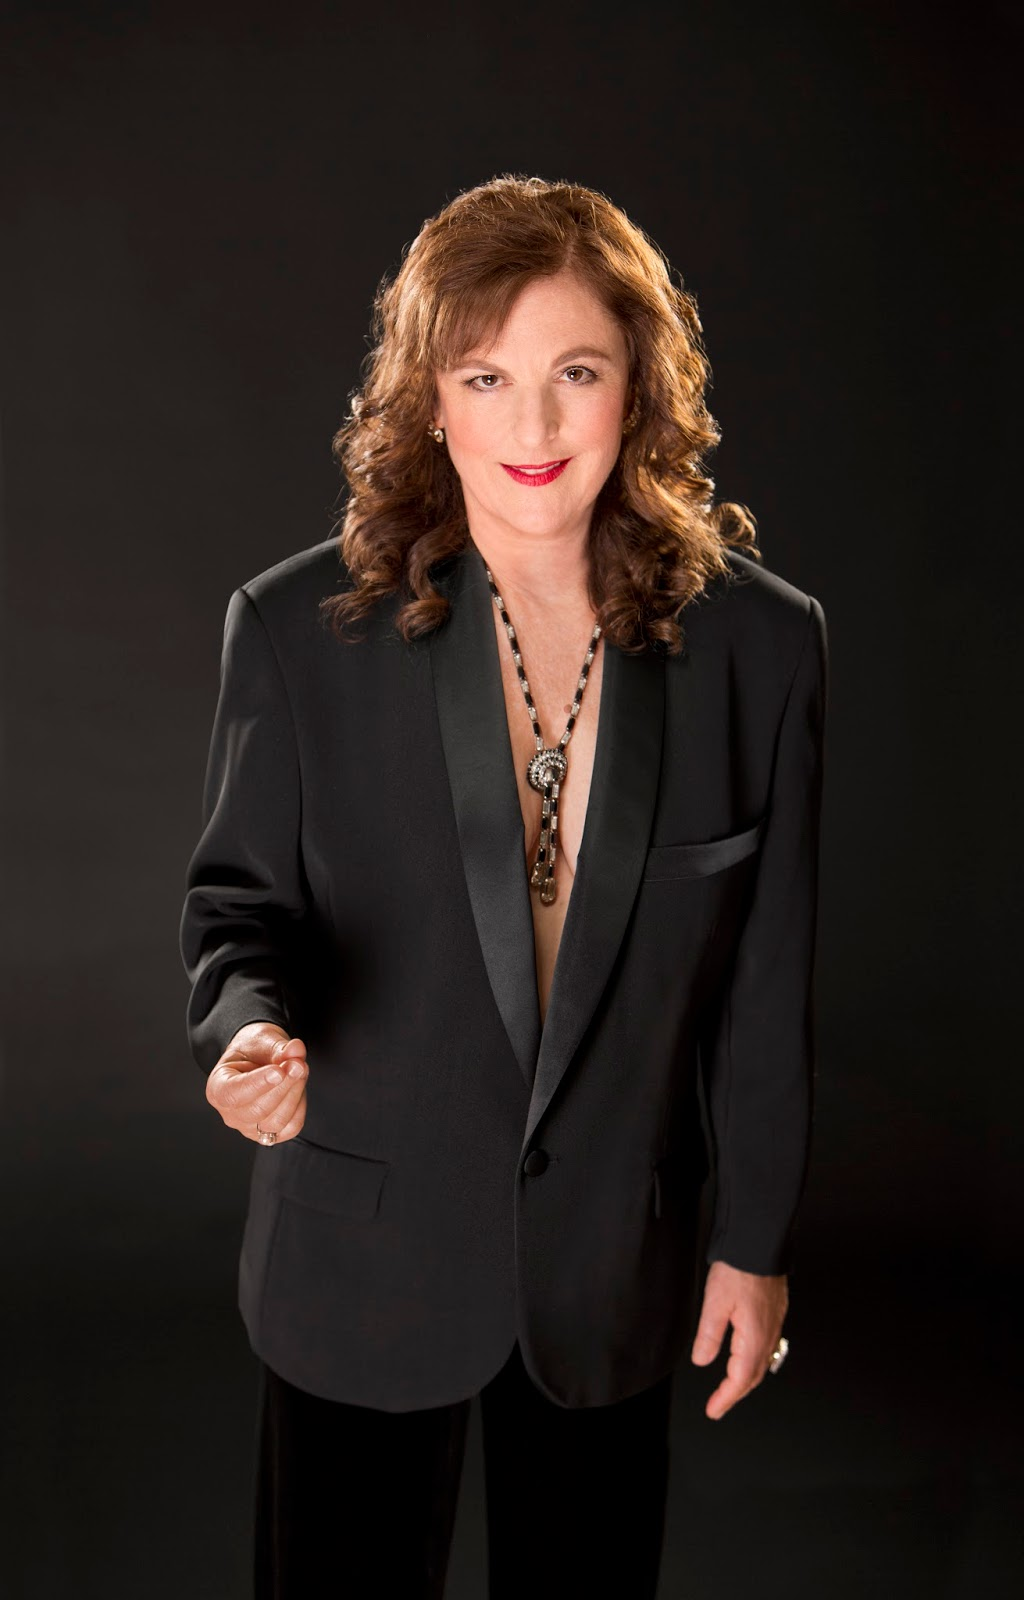 Lisa B (Lisa Bernstein) in tux